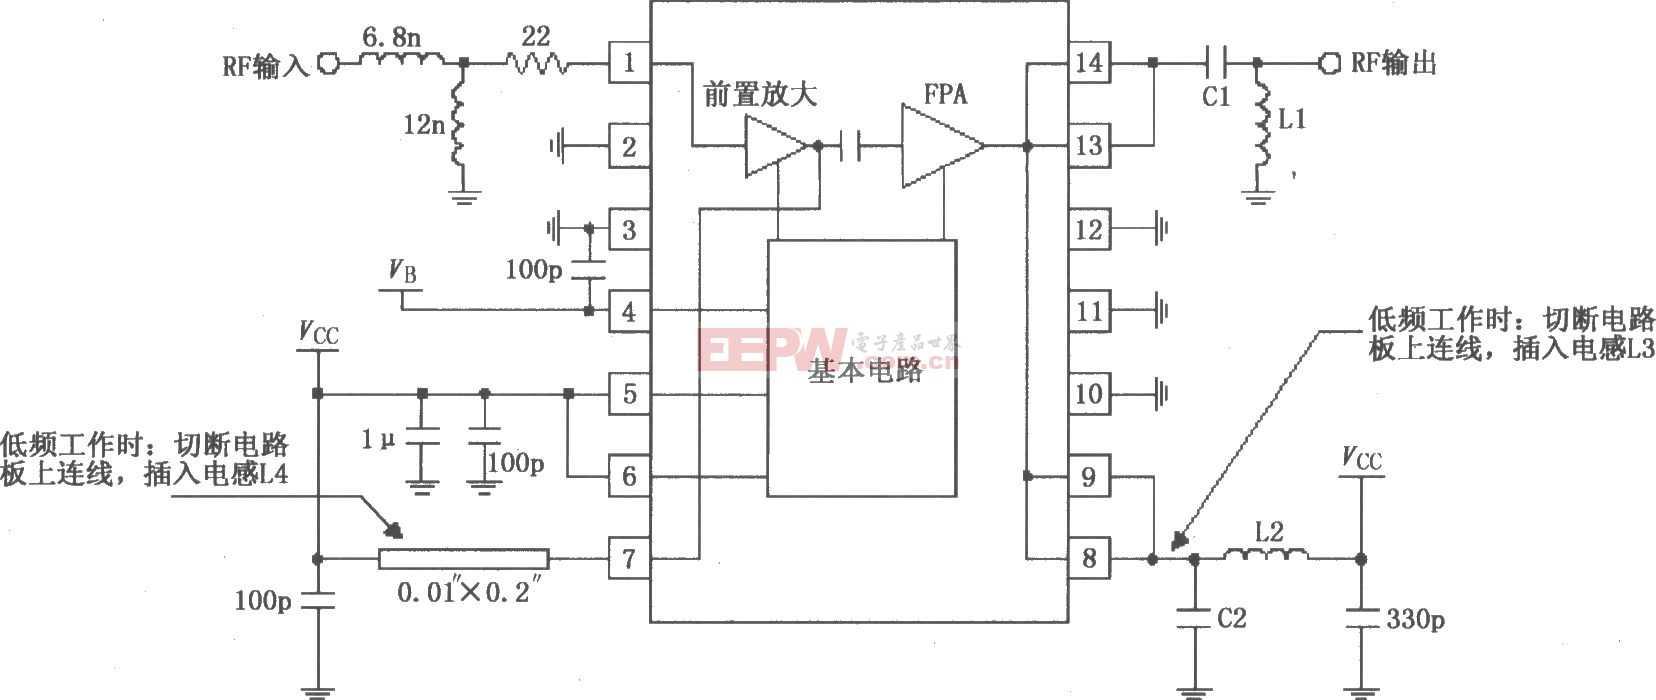 RF2103P构成的射频放大器原理电路图